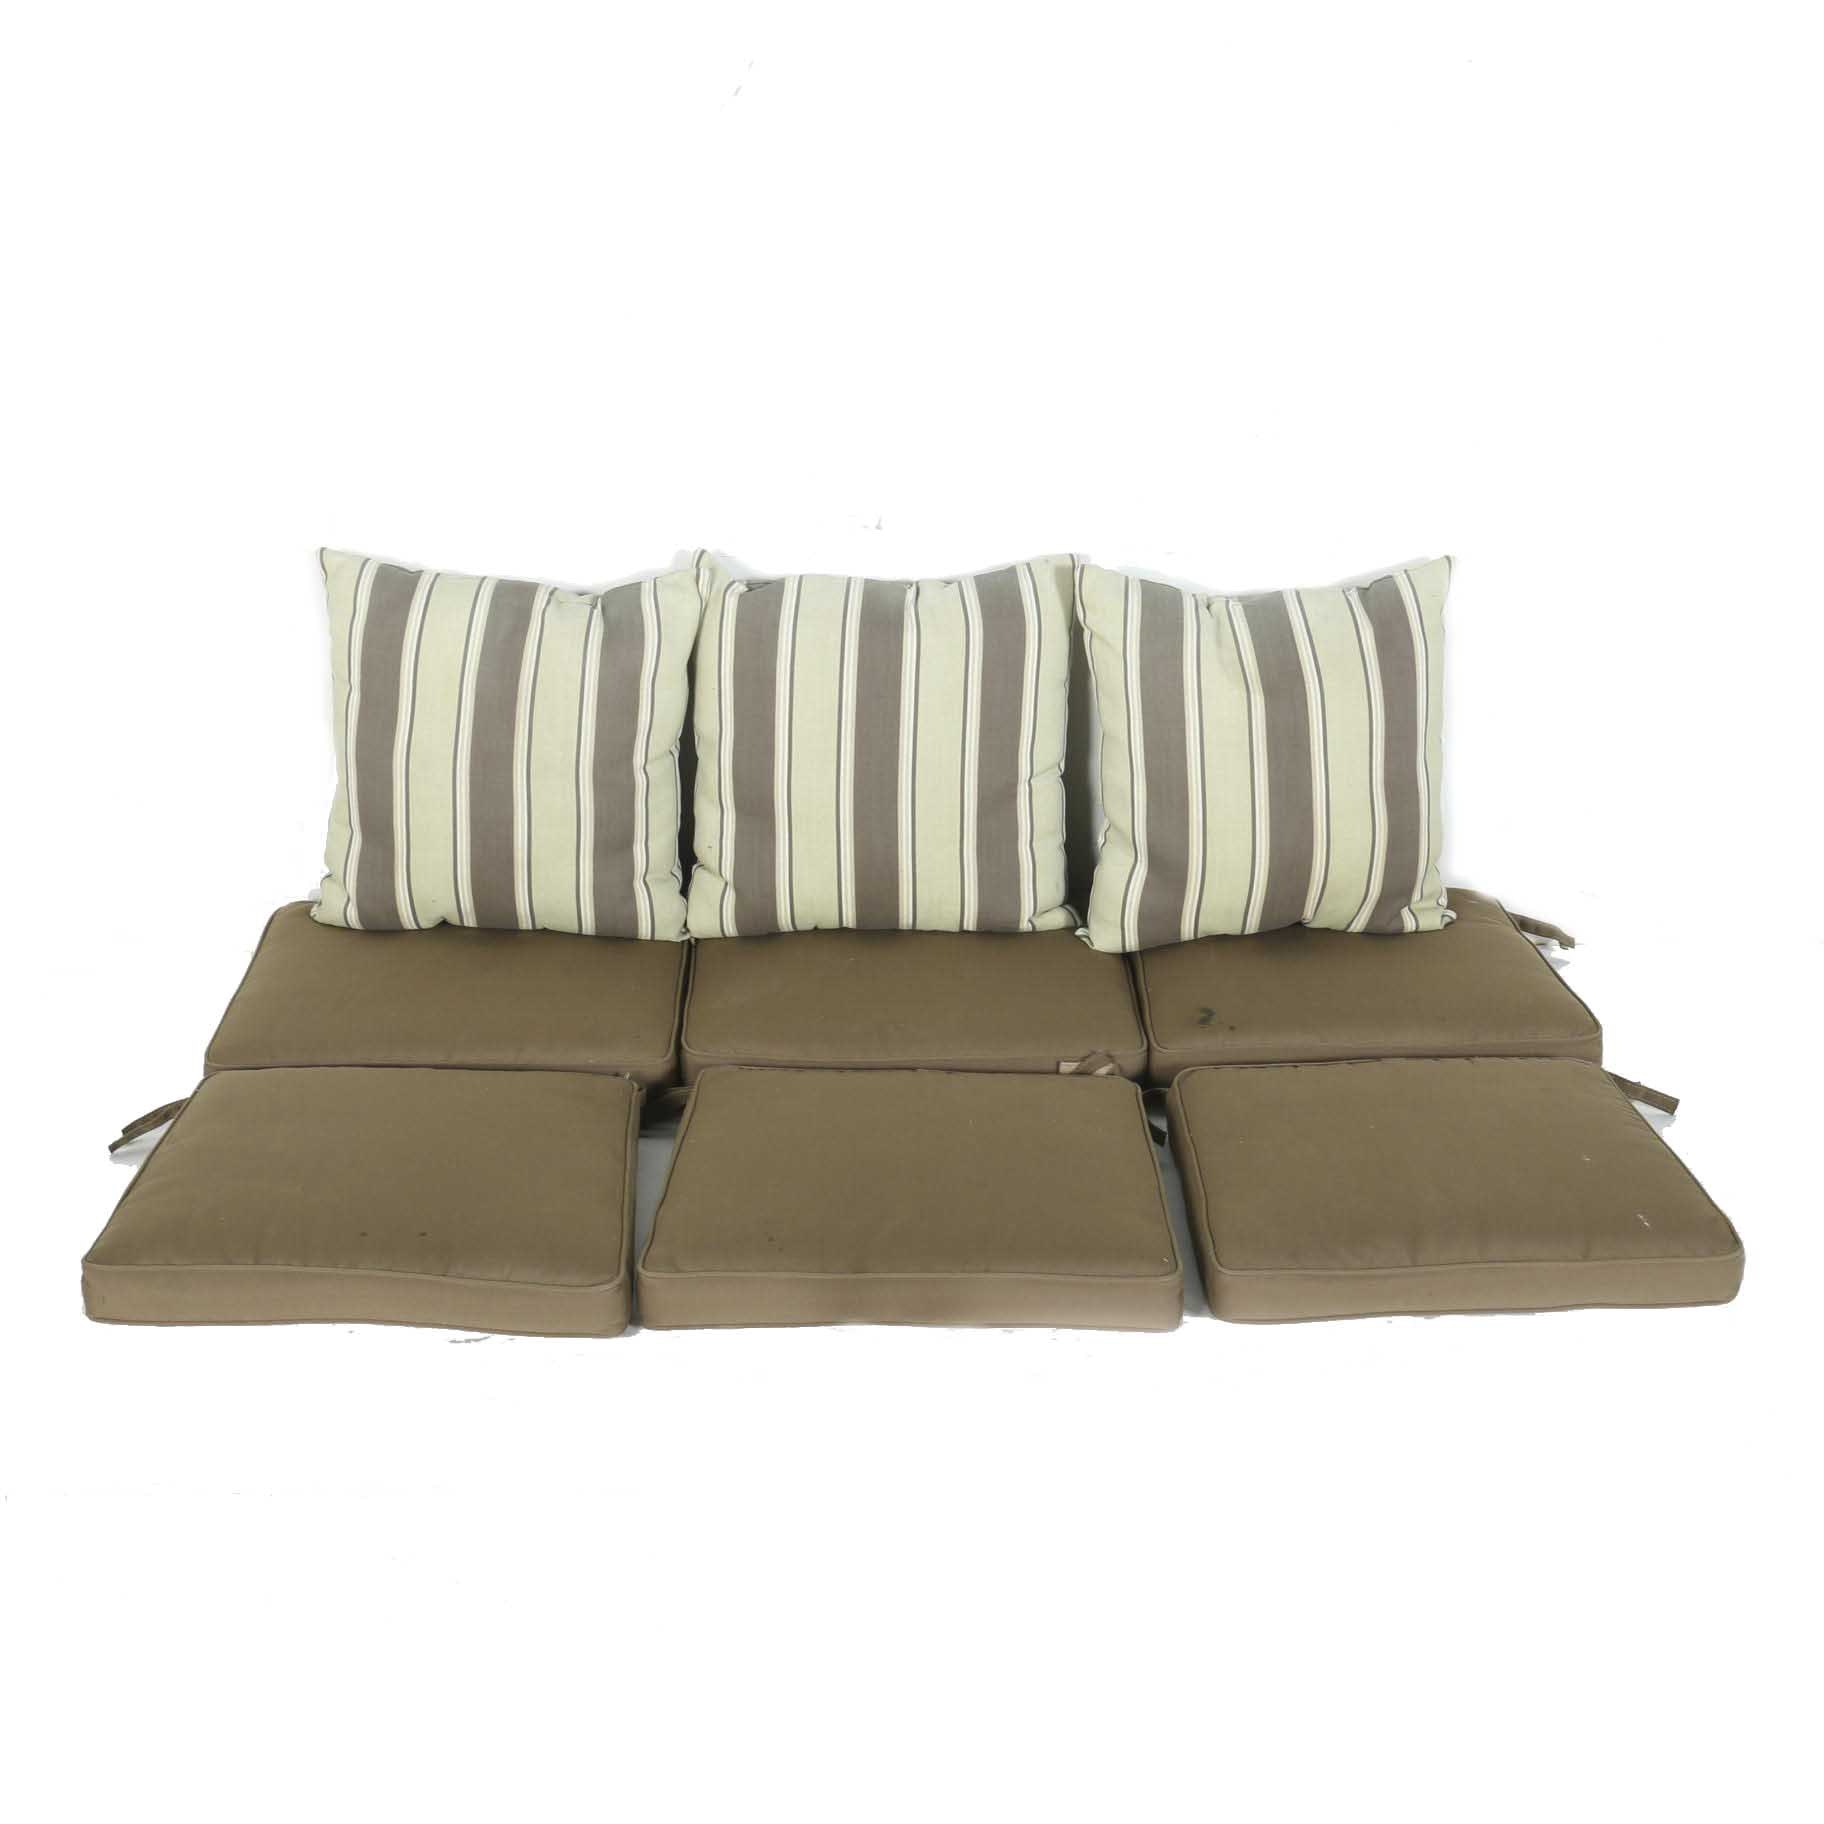 Patio Furniture Cushion Set